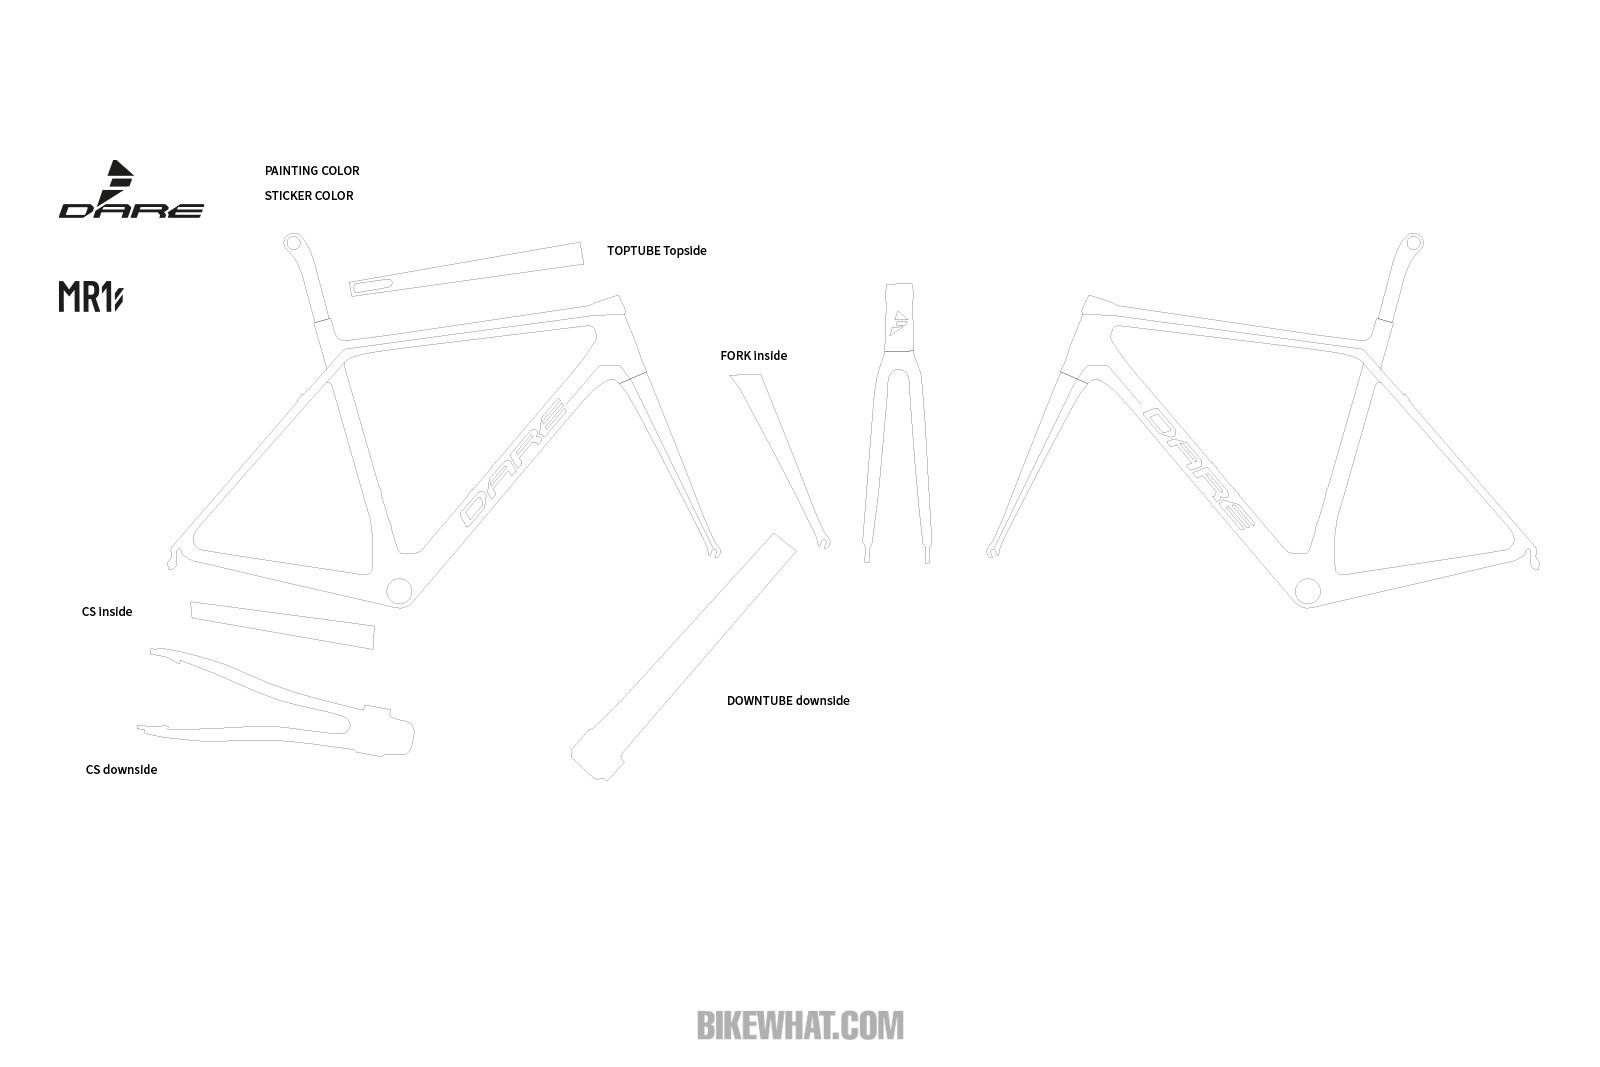 News_Velogic_Dare_Design_Contest_2.jpg